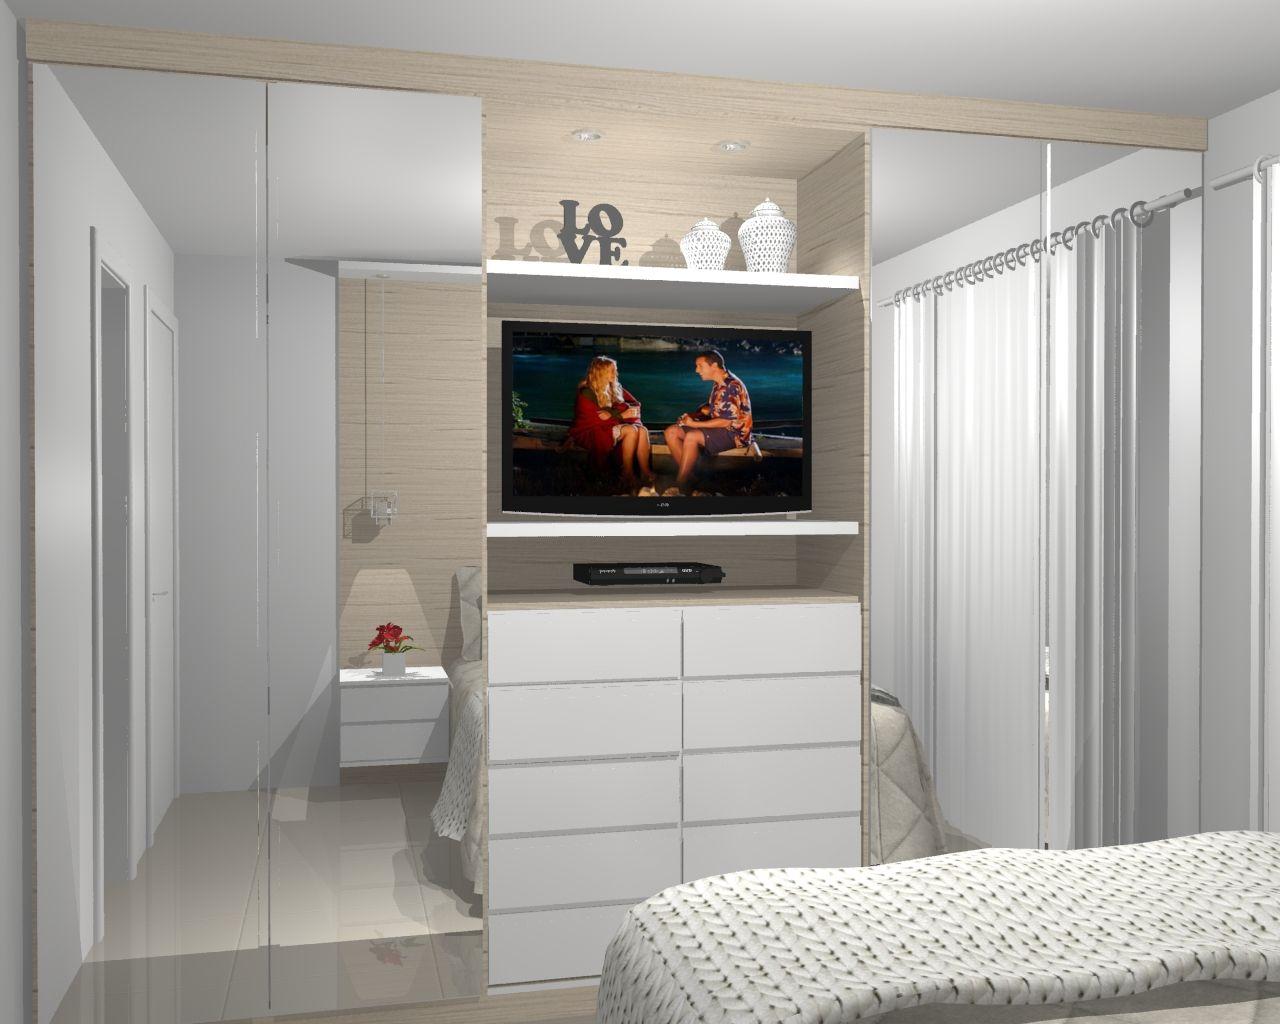 Guarda-roupa planejado branco com TV embutida.